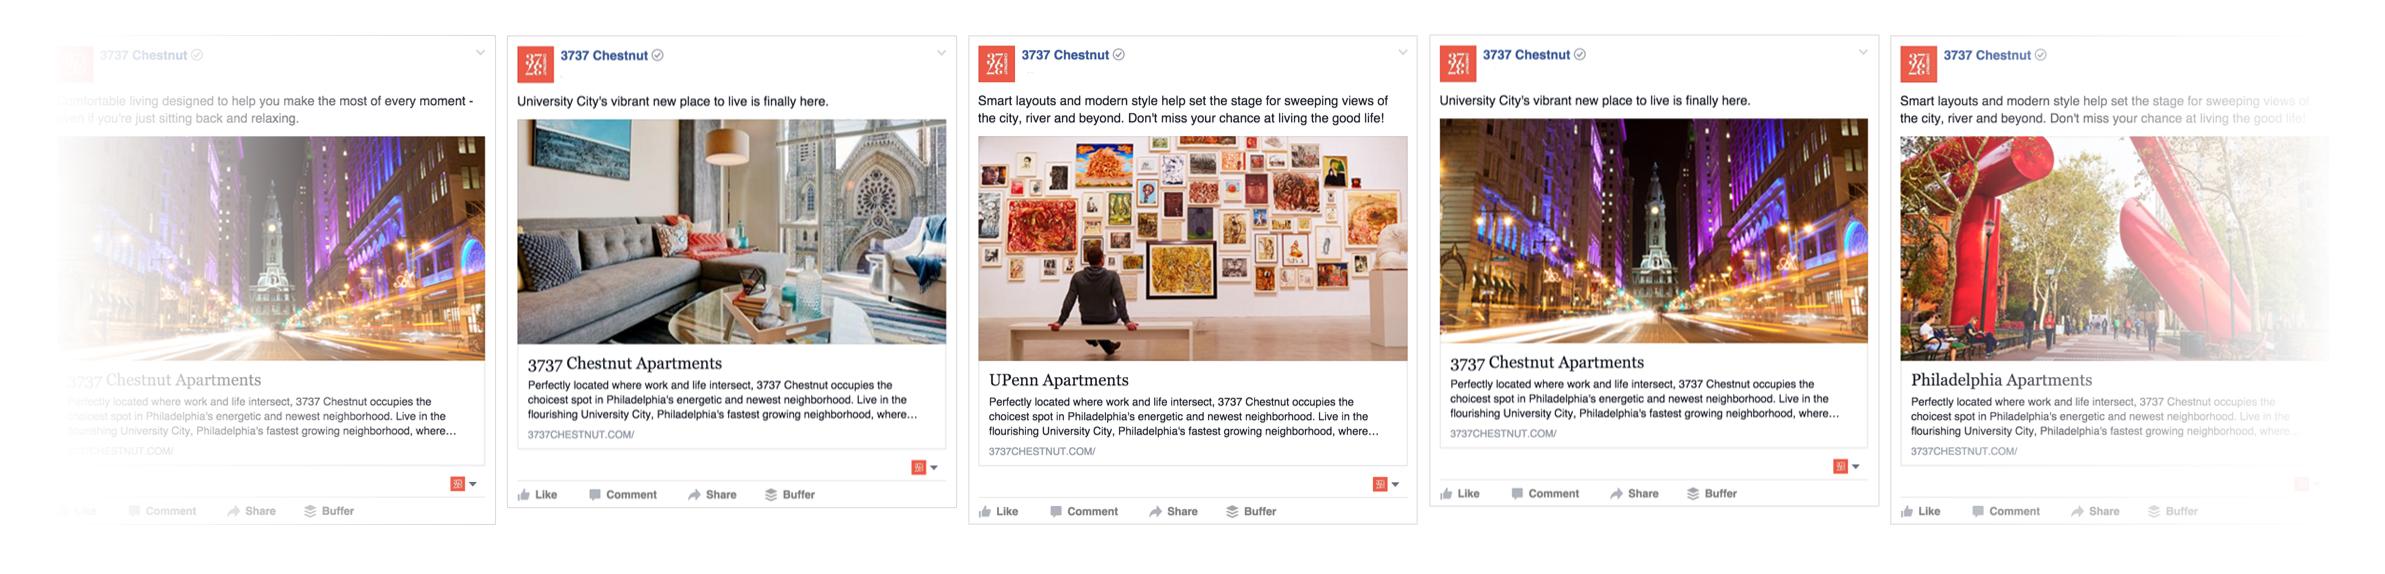 3737 Chestnut Facebook Ads